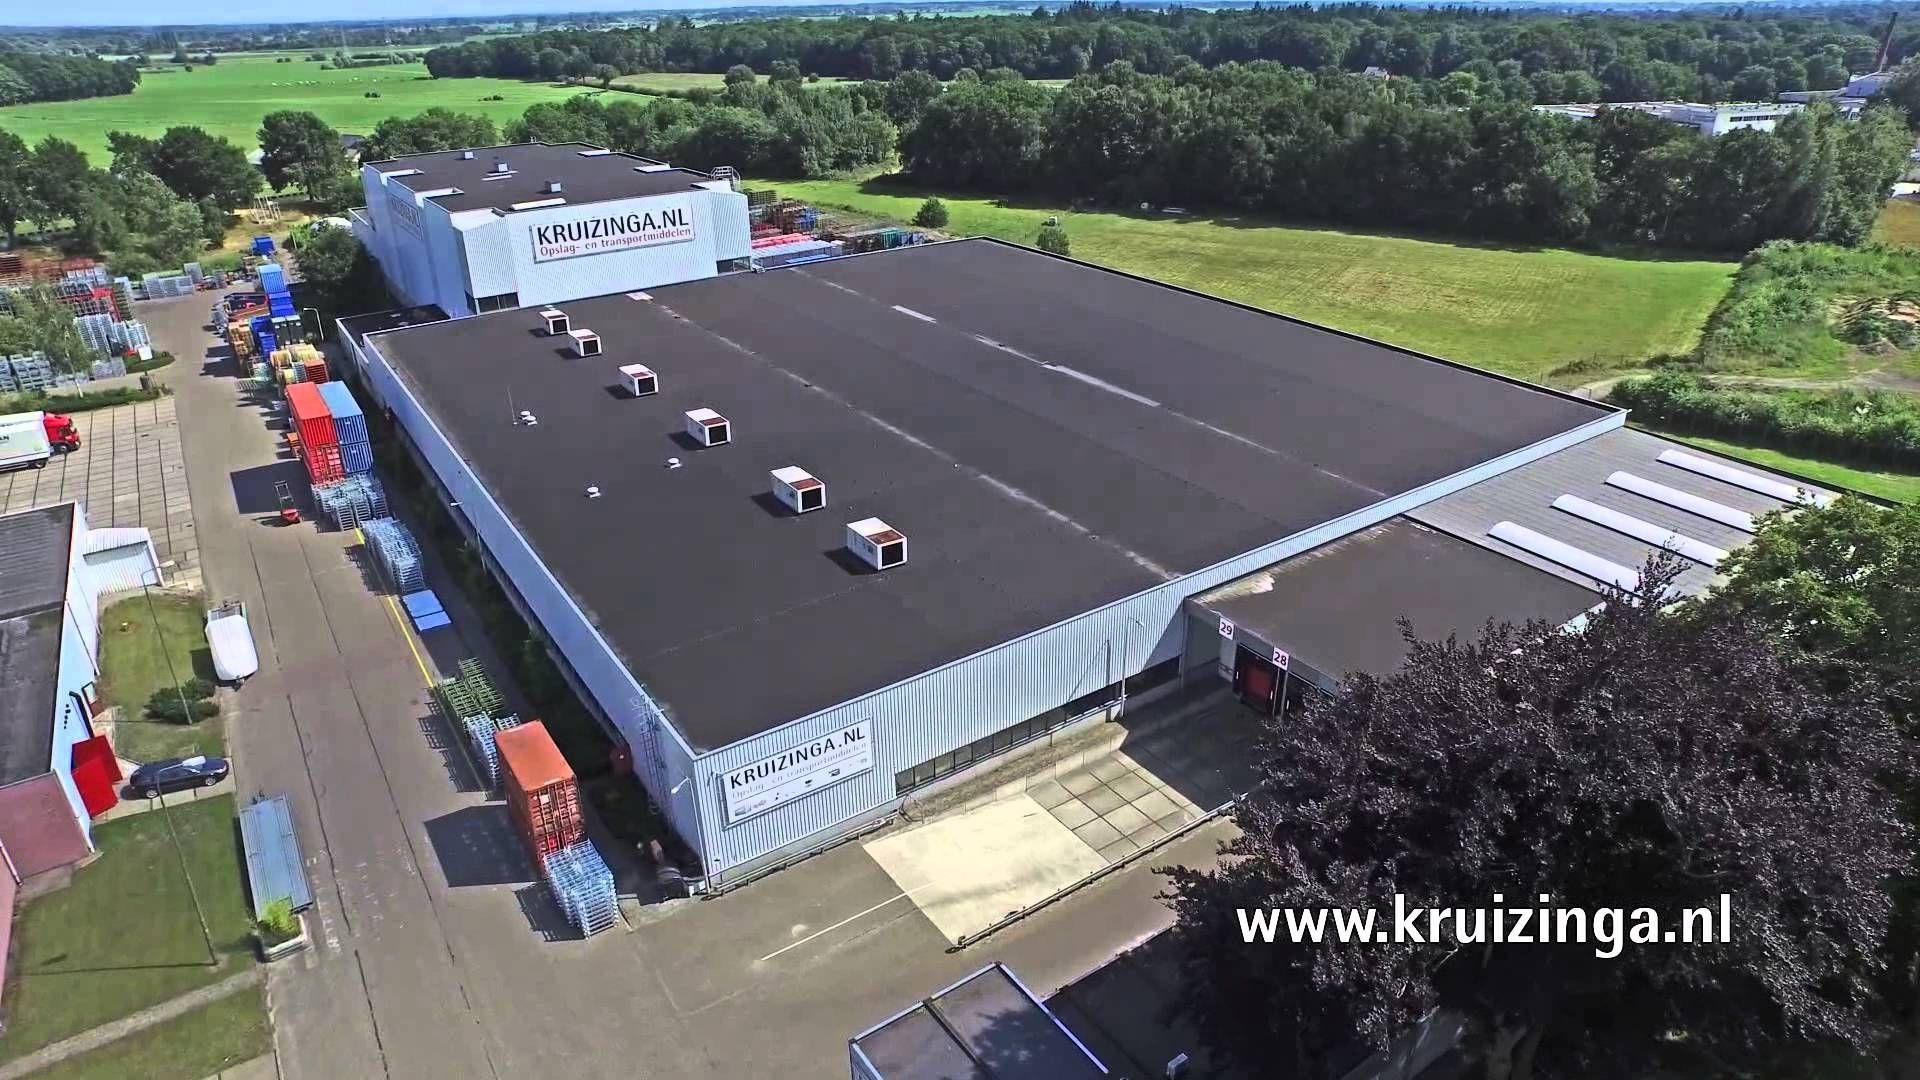 Kruizinga.nl vanuit de lucht